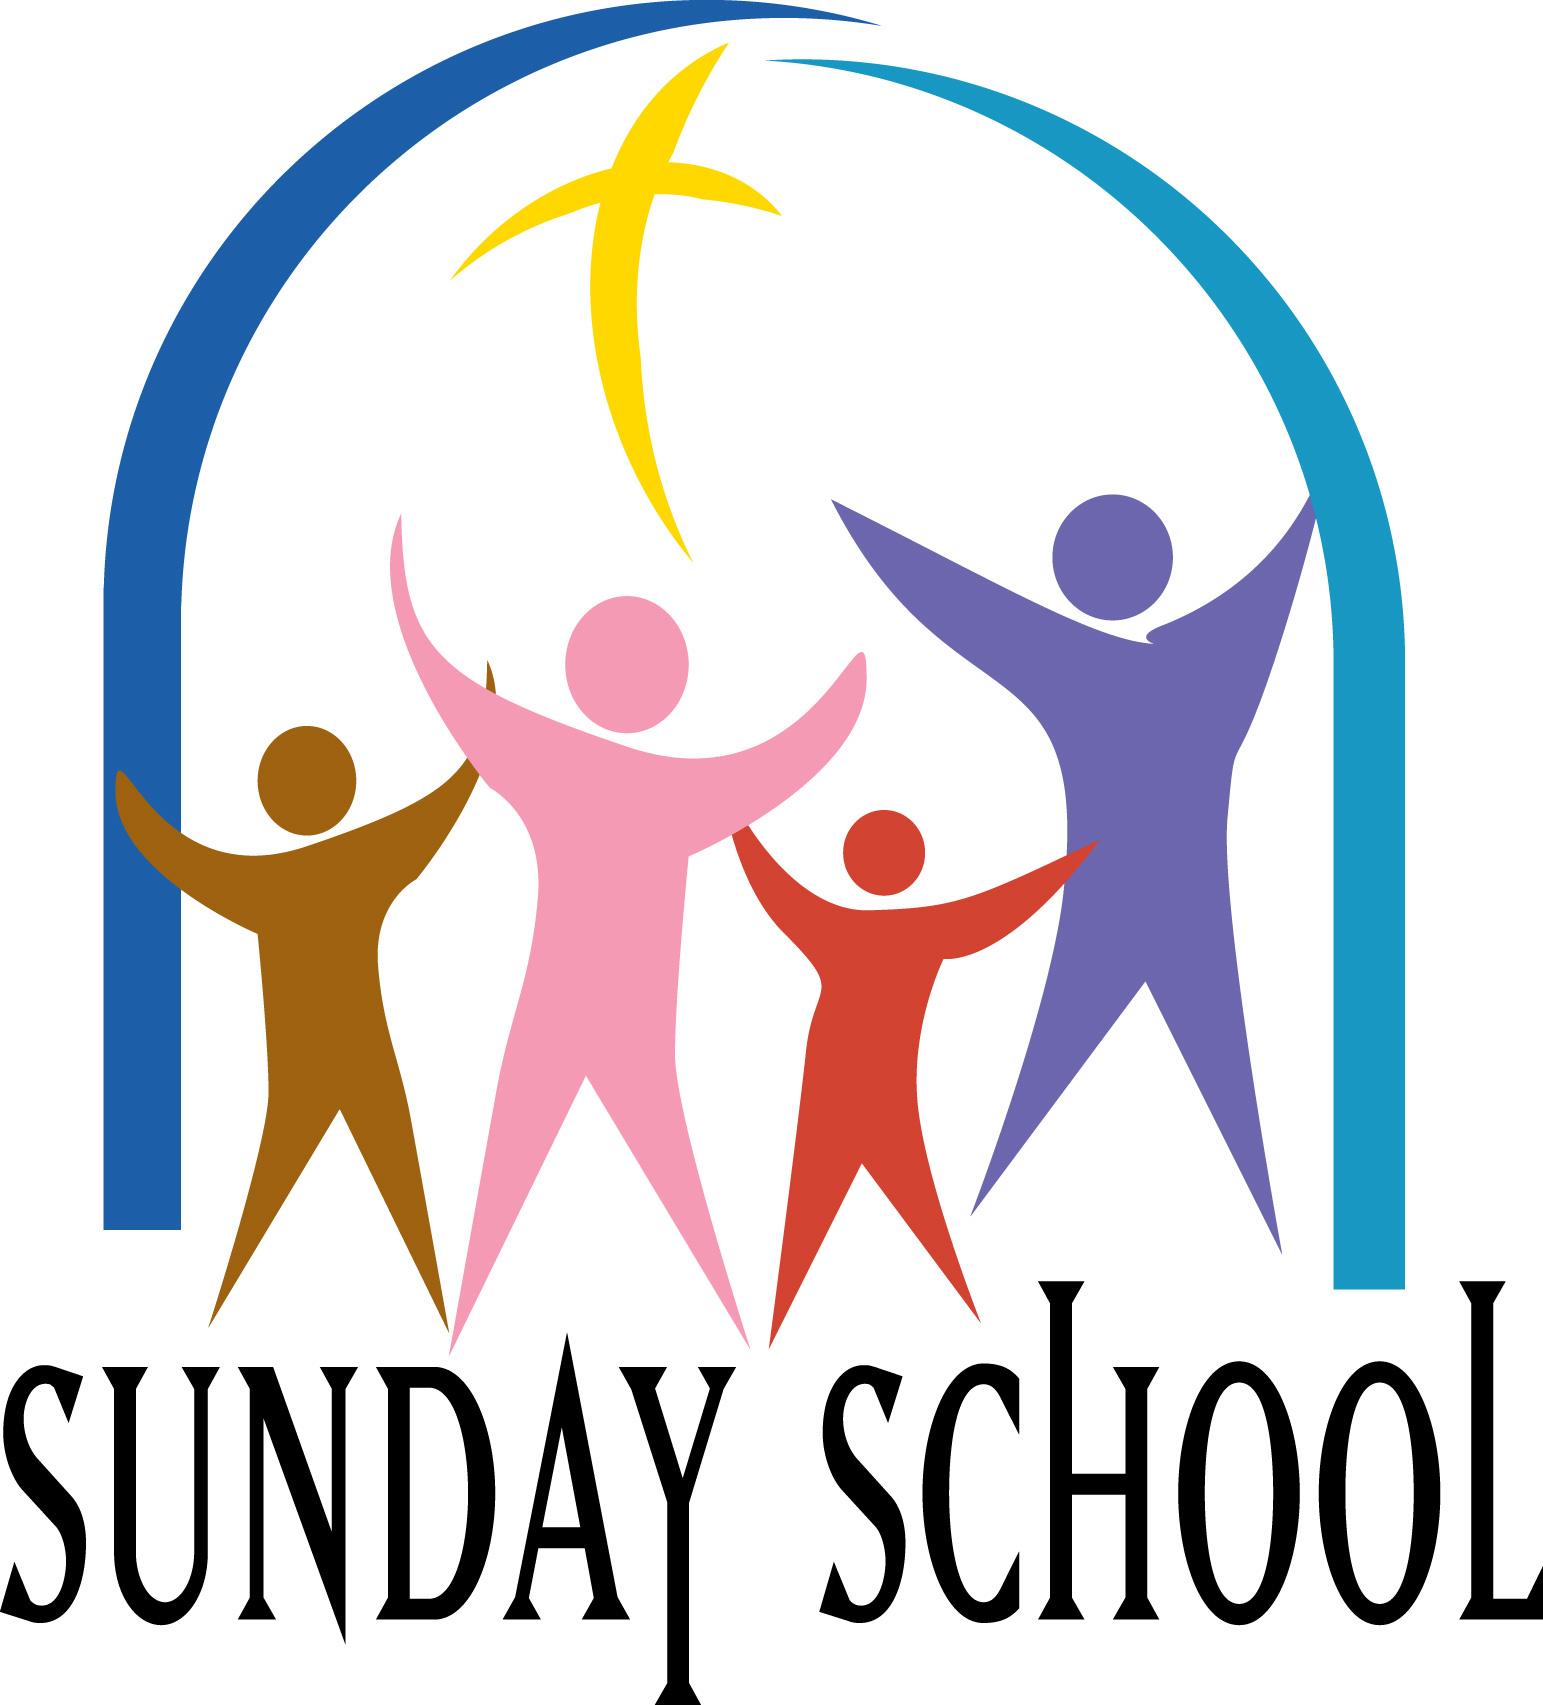 Sunday school program winstead united methodist church sunday school graphic buycottarizona Image collections